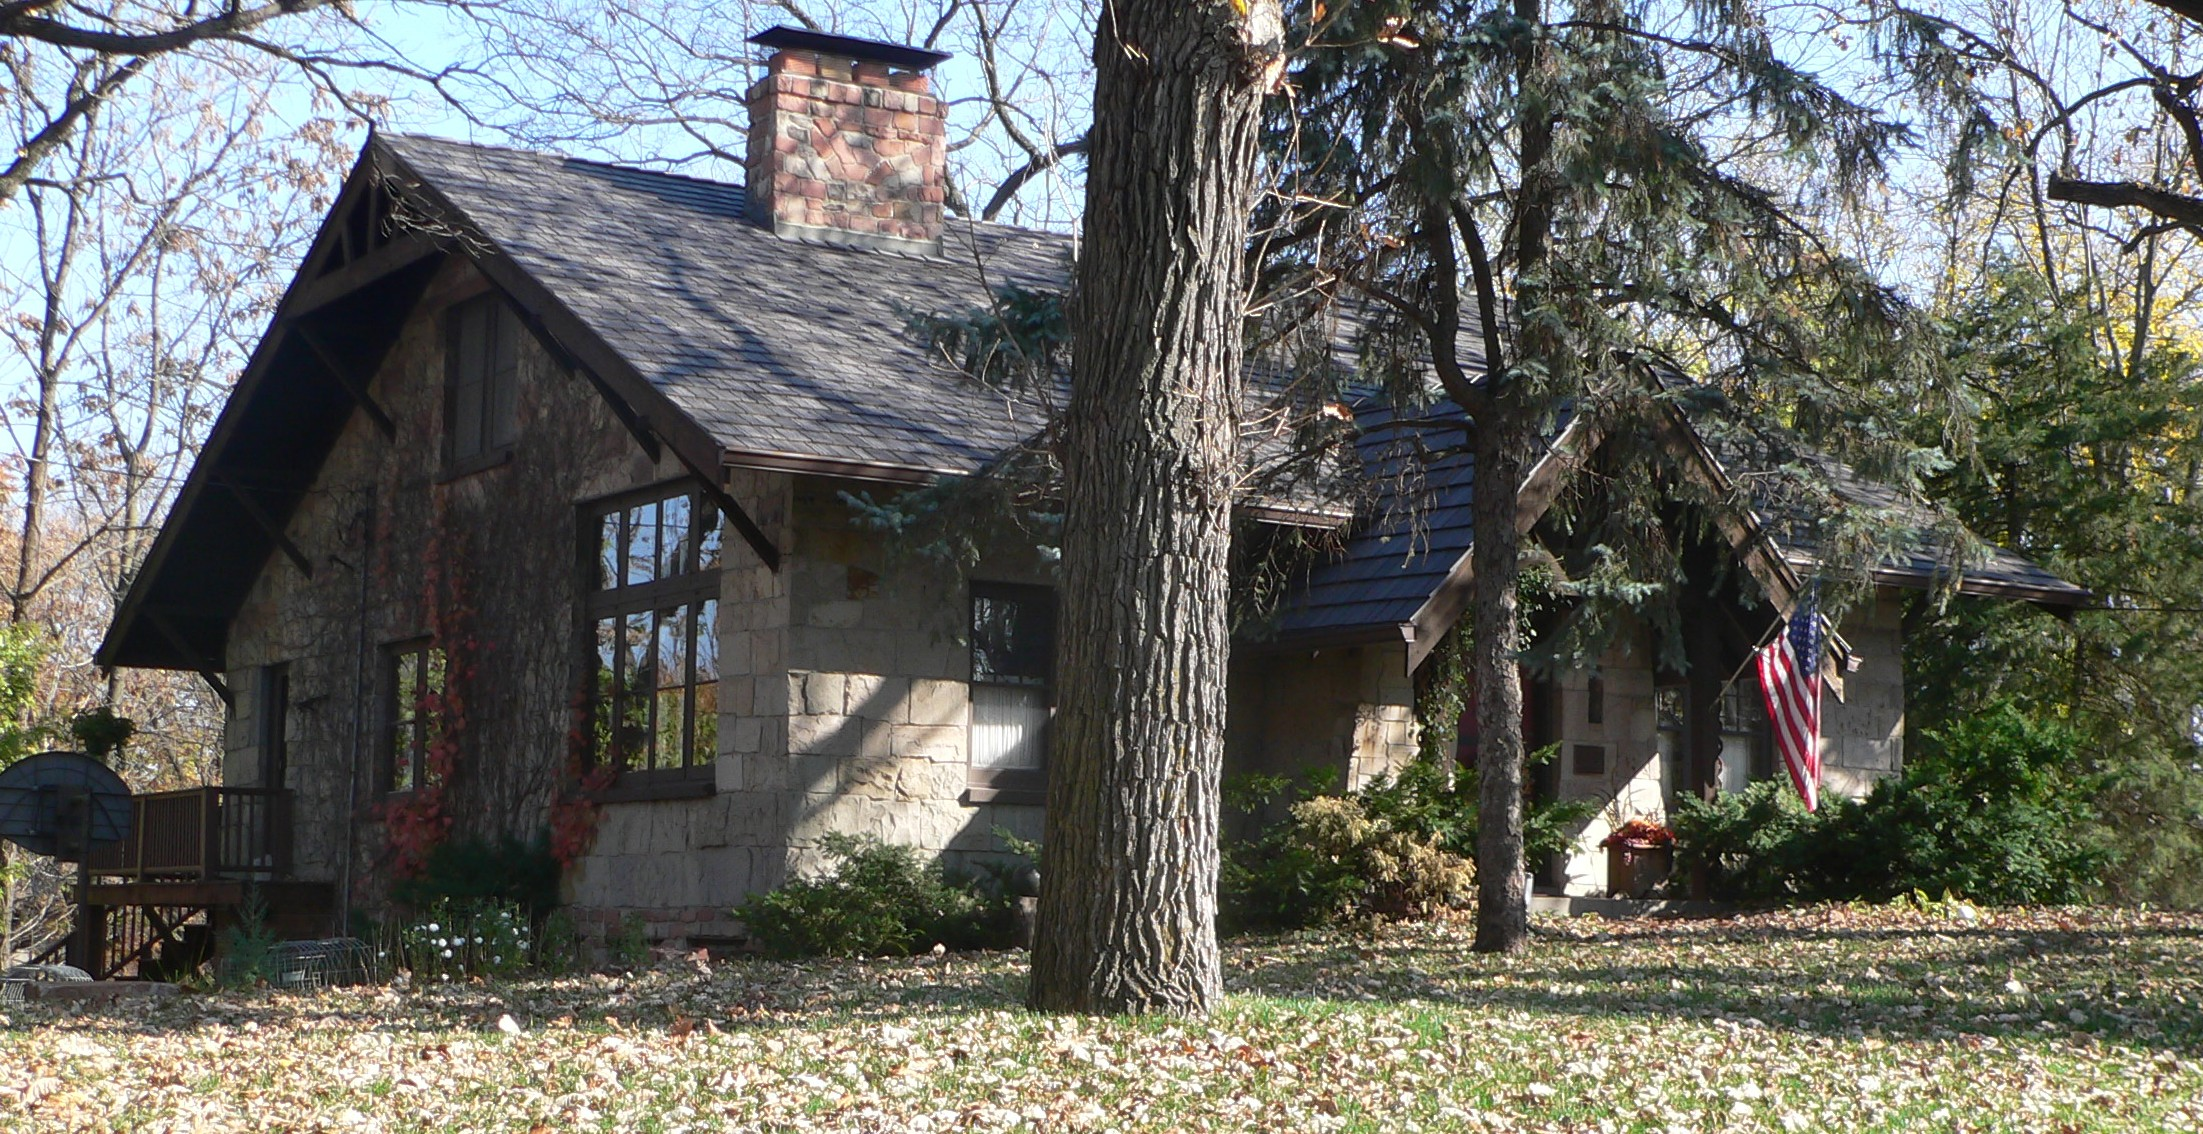 Datei:William E Gordon house (Bellevue, NE) from NE 1.jpg – Wikipedia